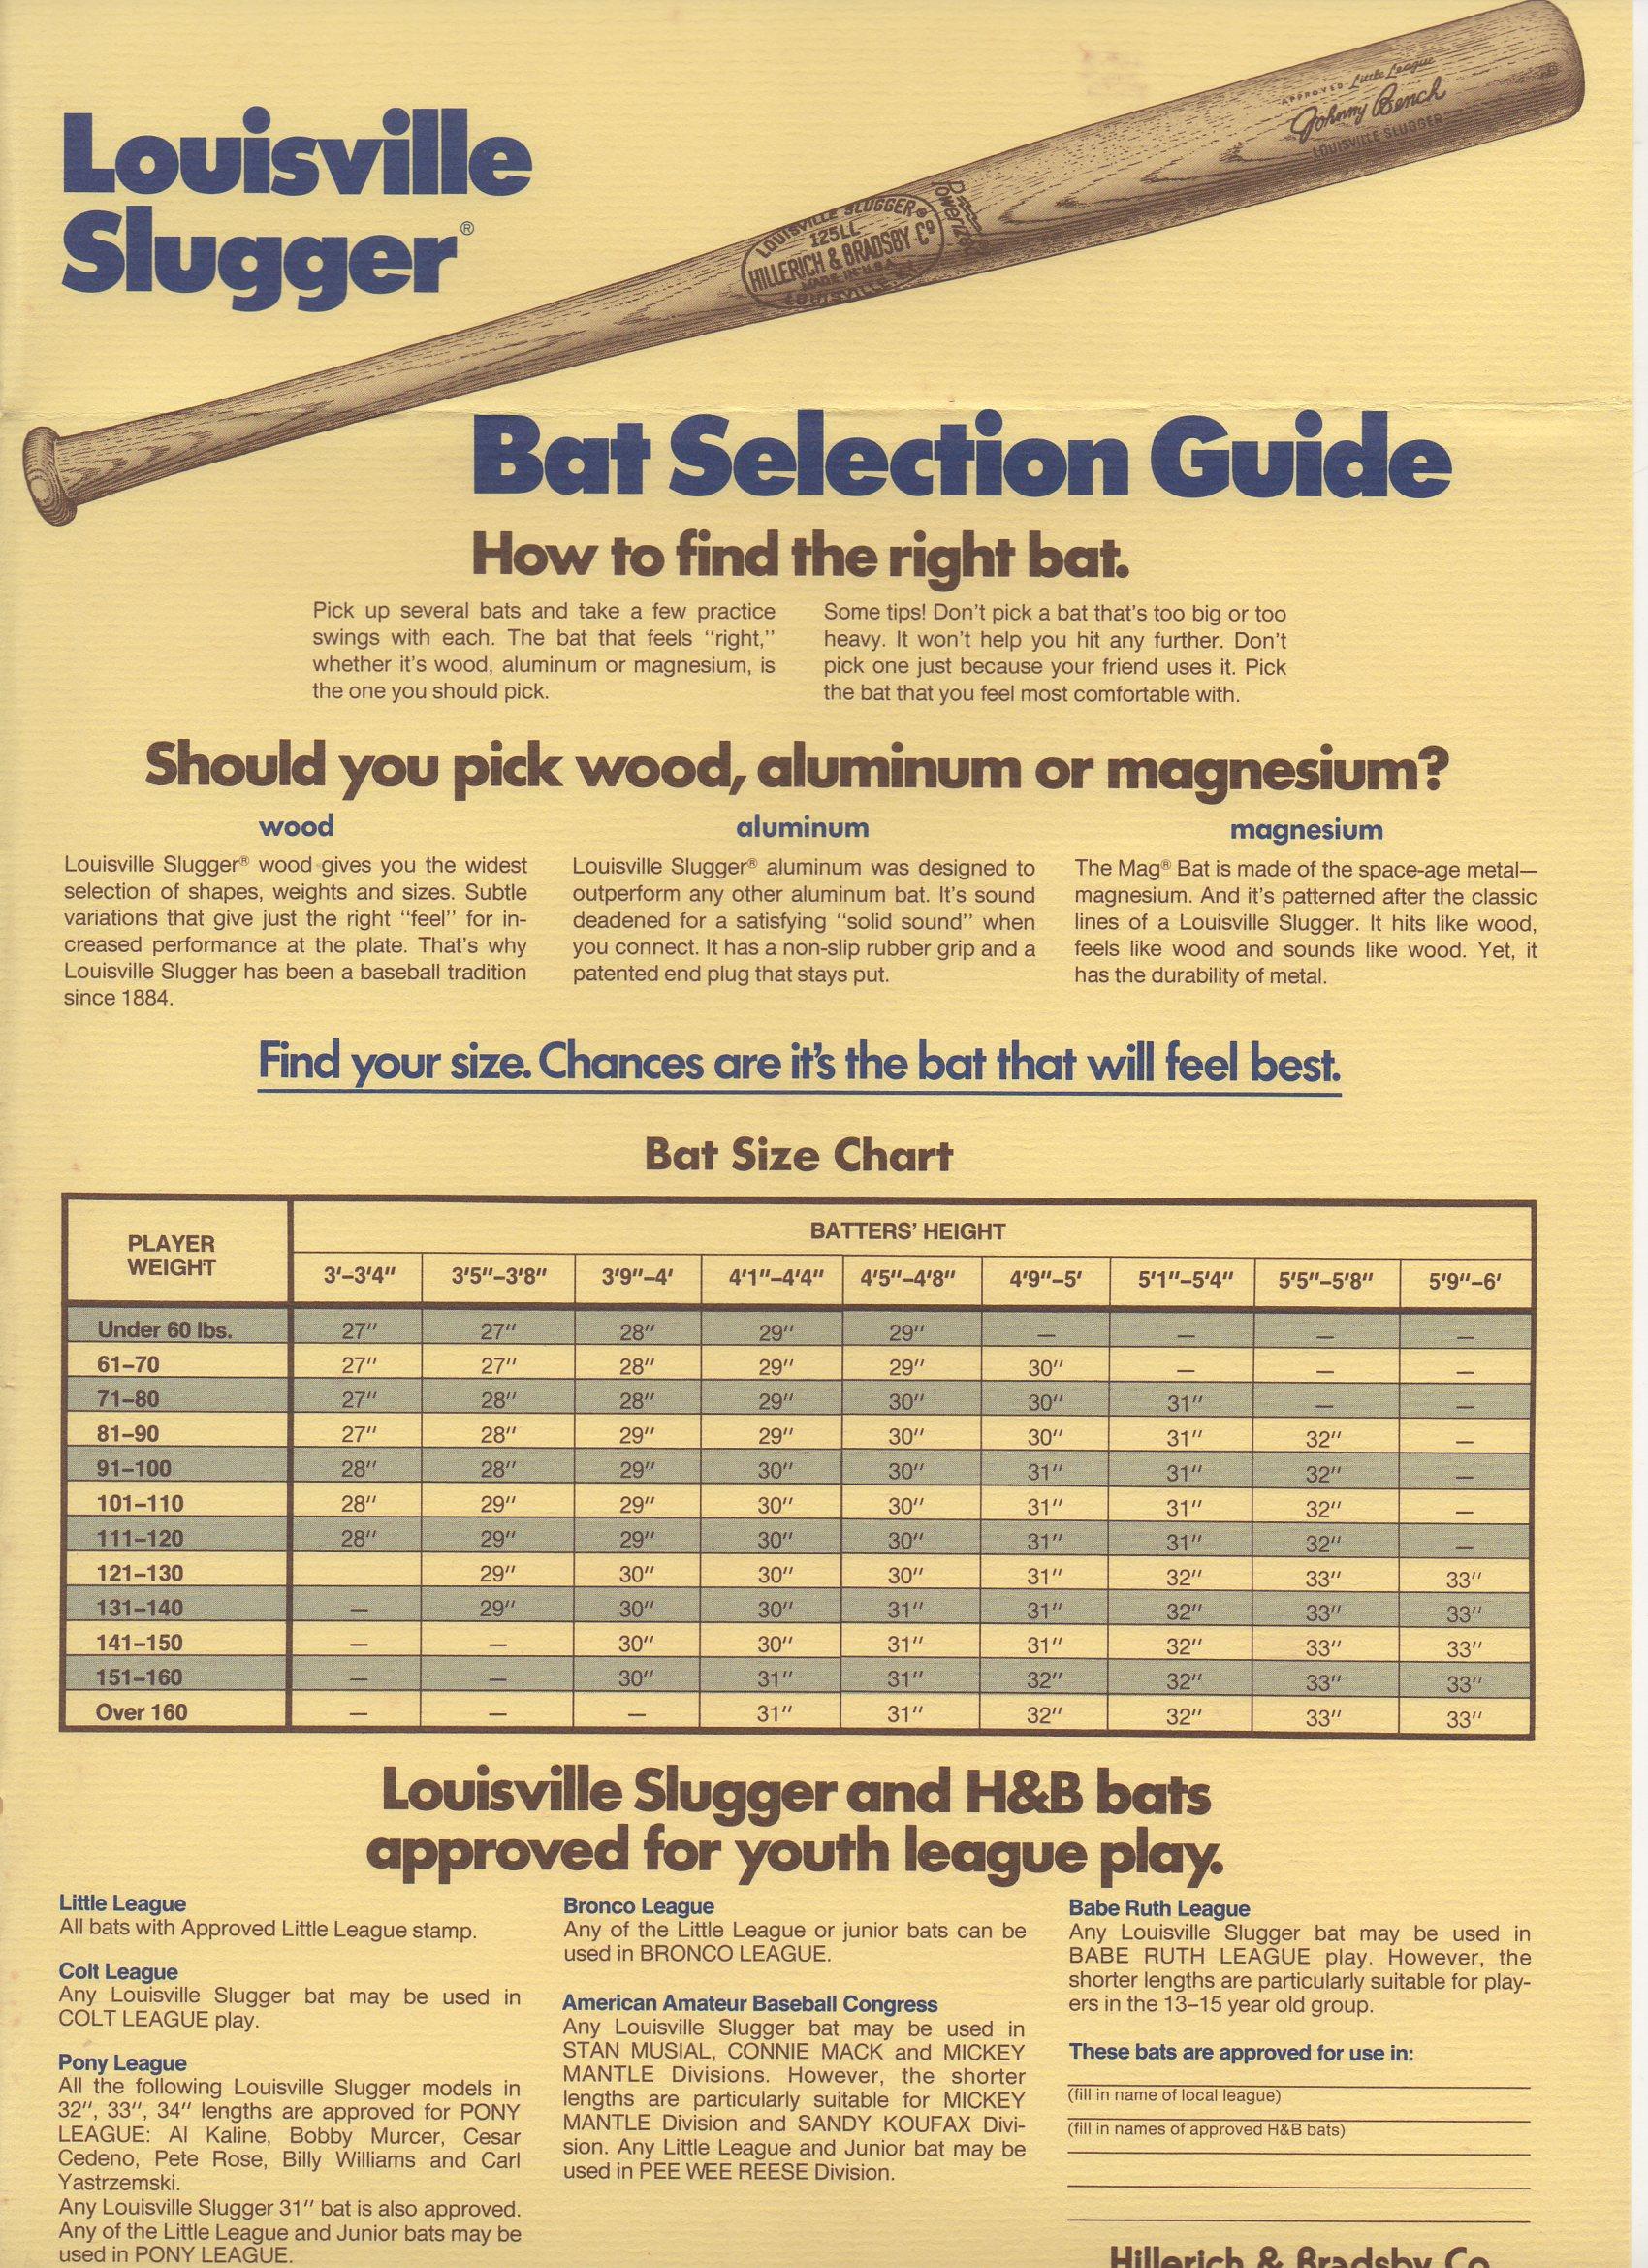 1977 catalog insert size chart